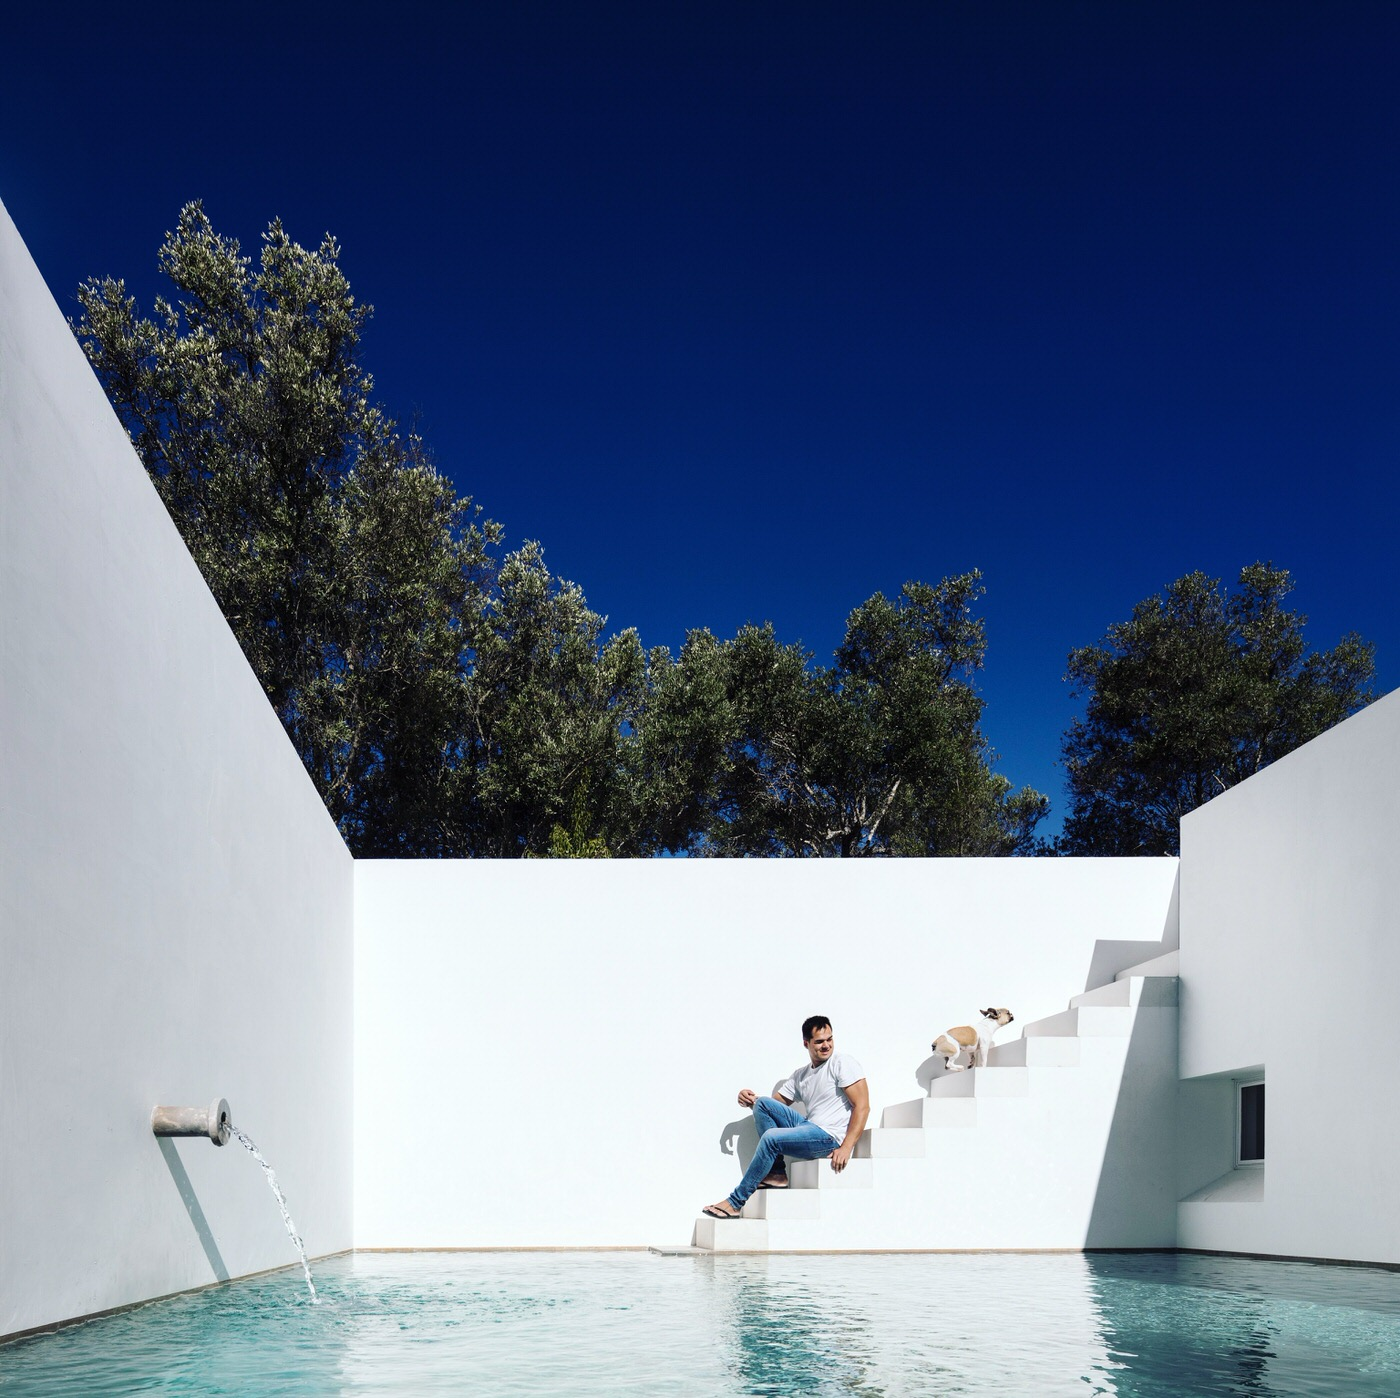 Zalig-Algarve-Casa-Luum-162-1